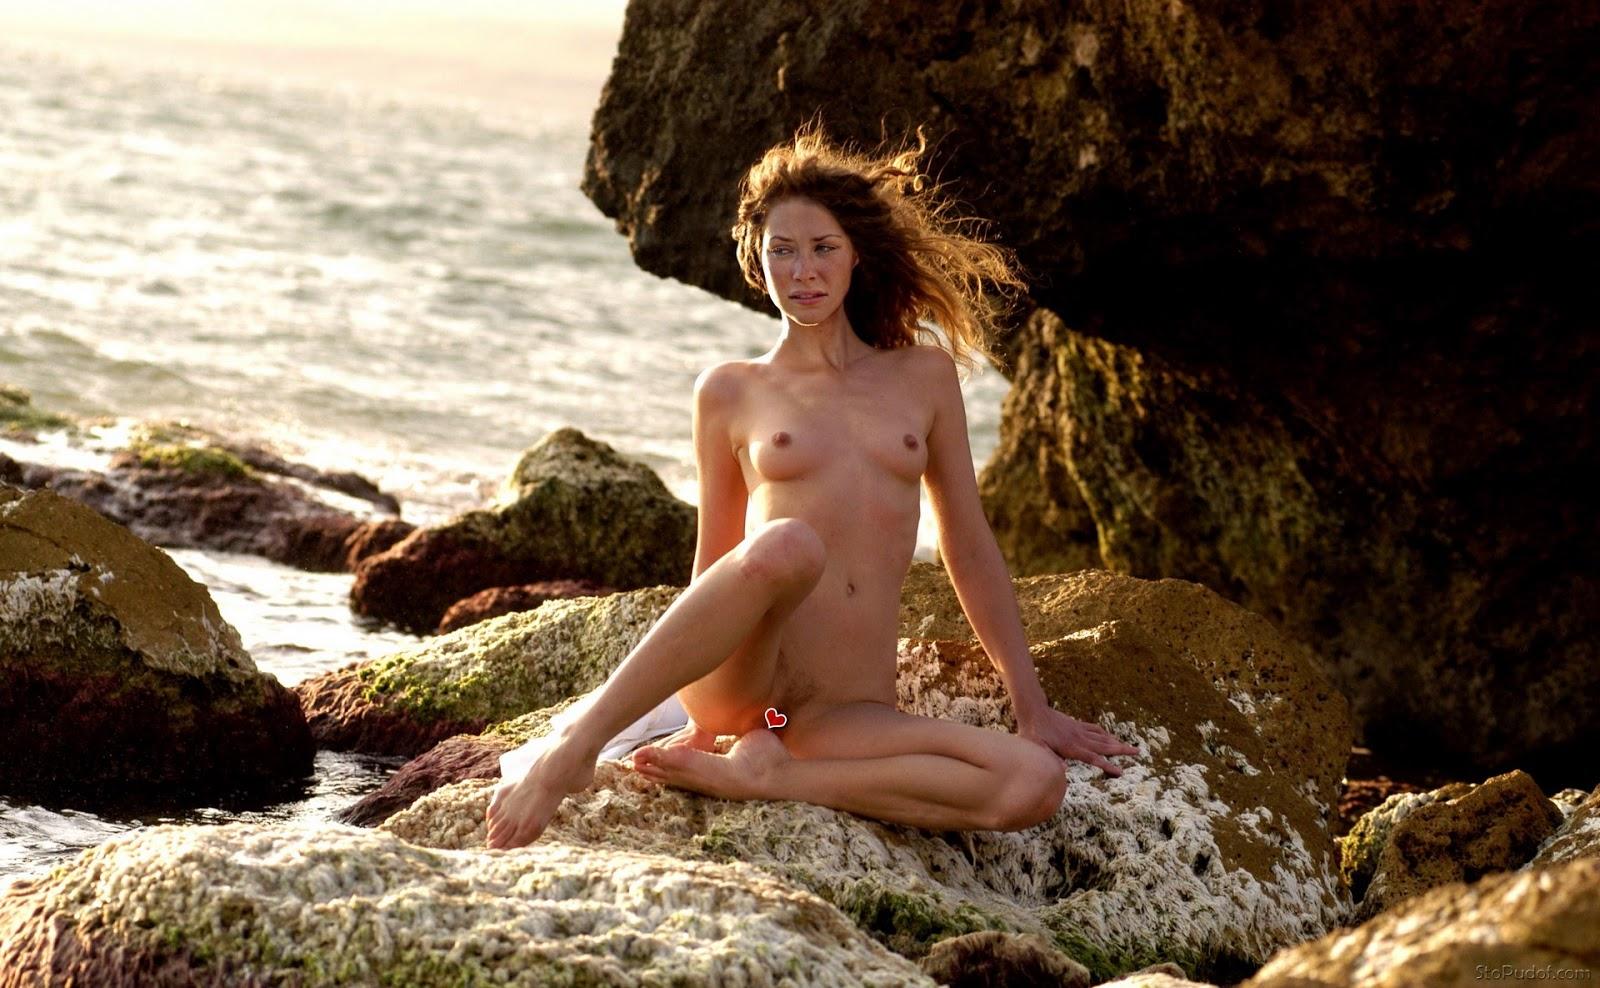 Evangeline lilly joi wanksgiving deepfake porn